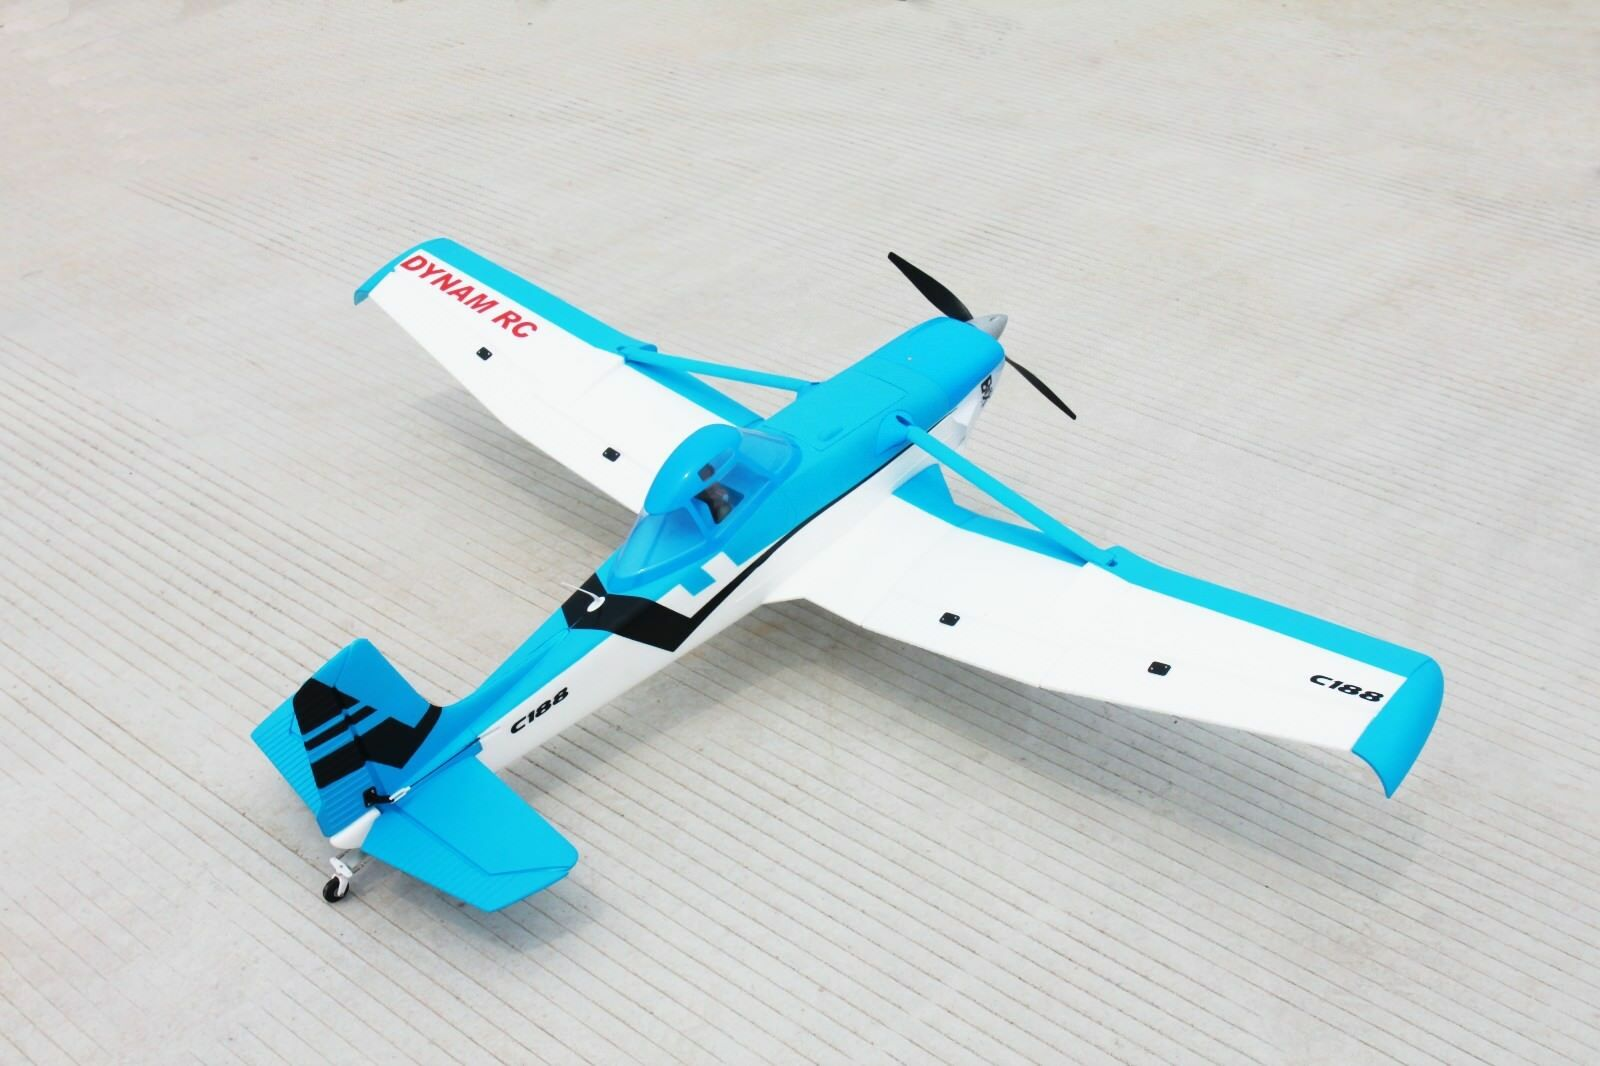 Dynam RC Airplane Cessna 188 bluee 1500mm Wingspan - SRTF